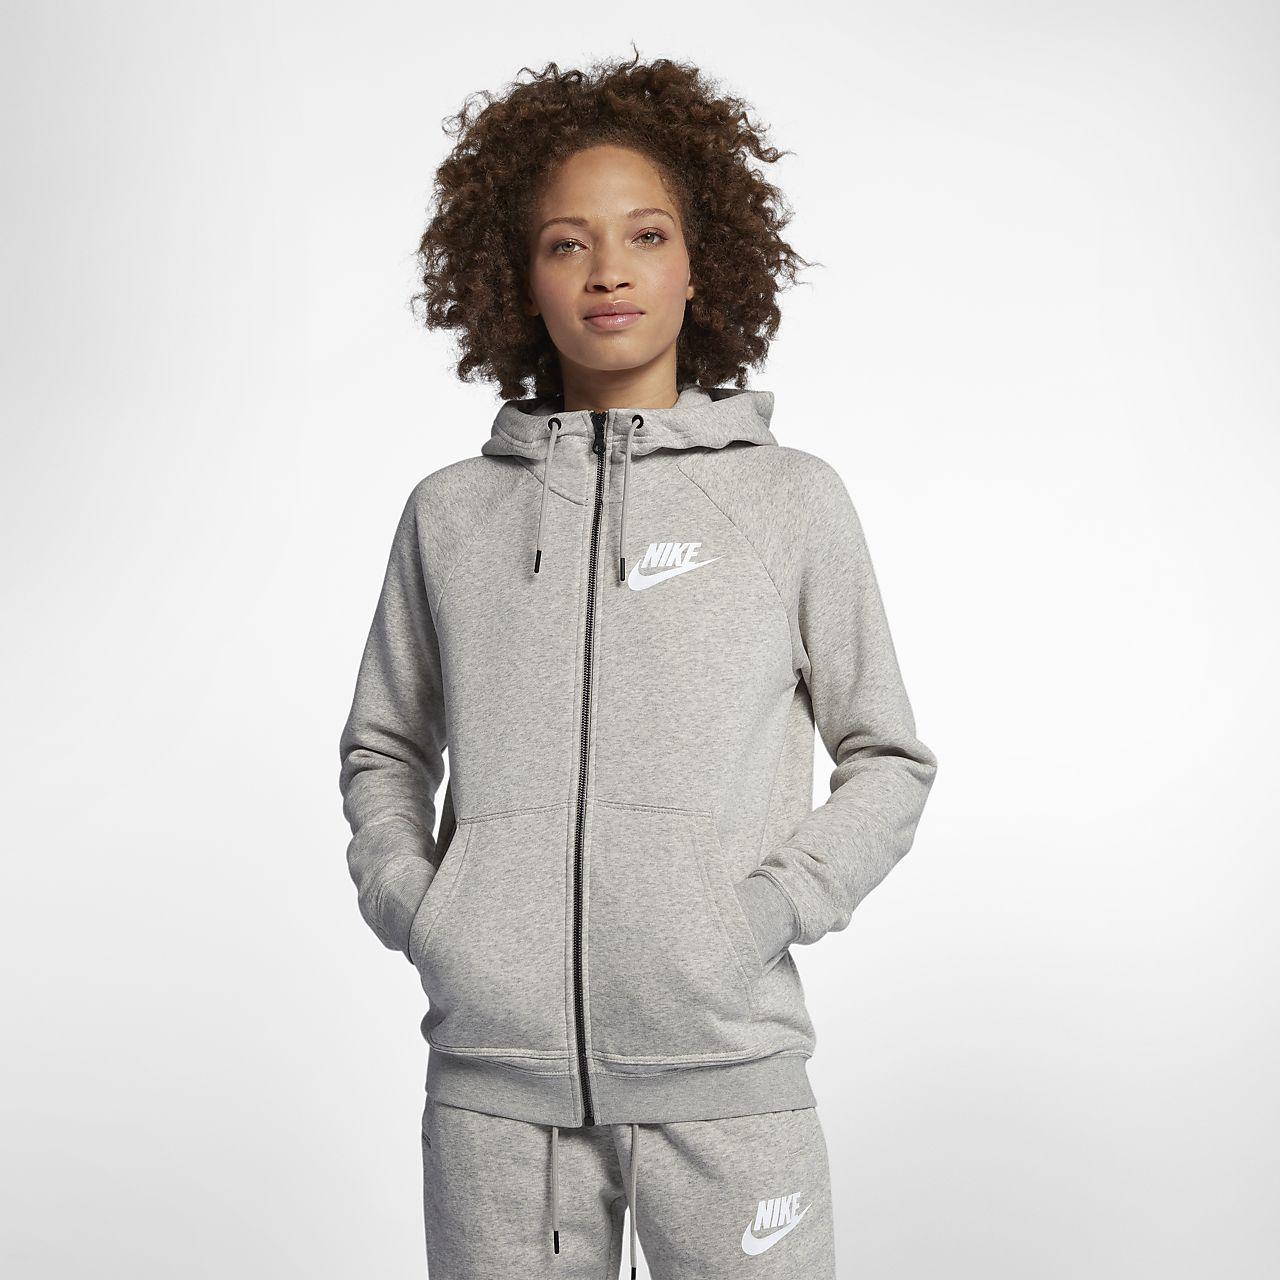 8a10ee0a887d Nike Sportswear Rally Women s Full-Zip Hoodie. Nike.com LU